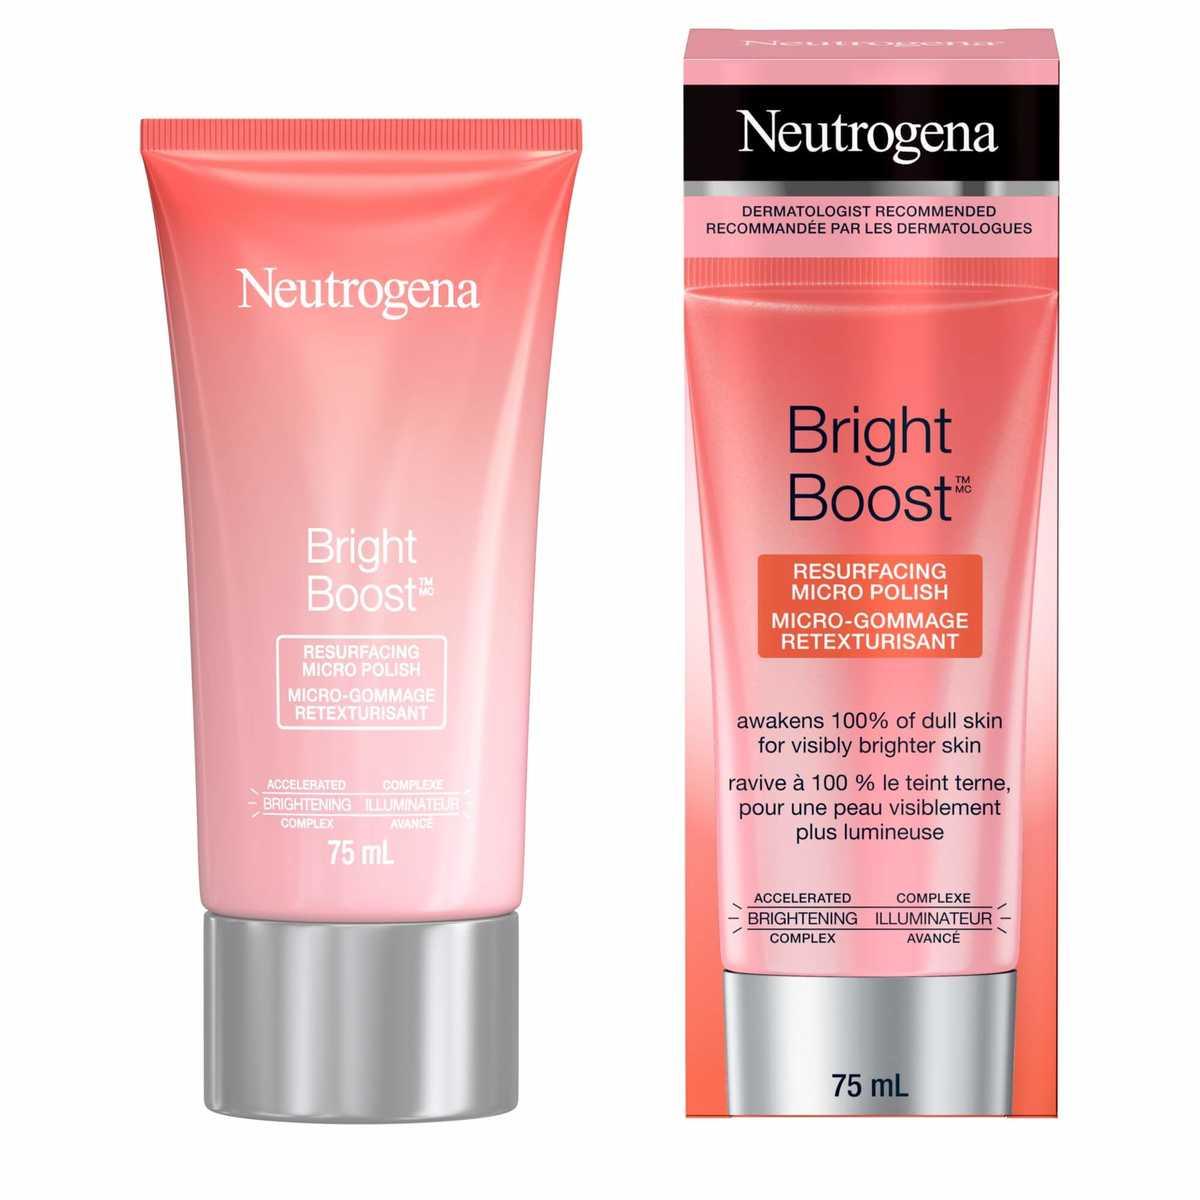 Micro-gommage retexturisant Neutrogena Bright Boost